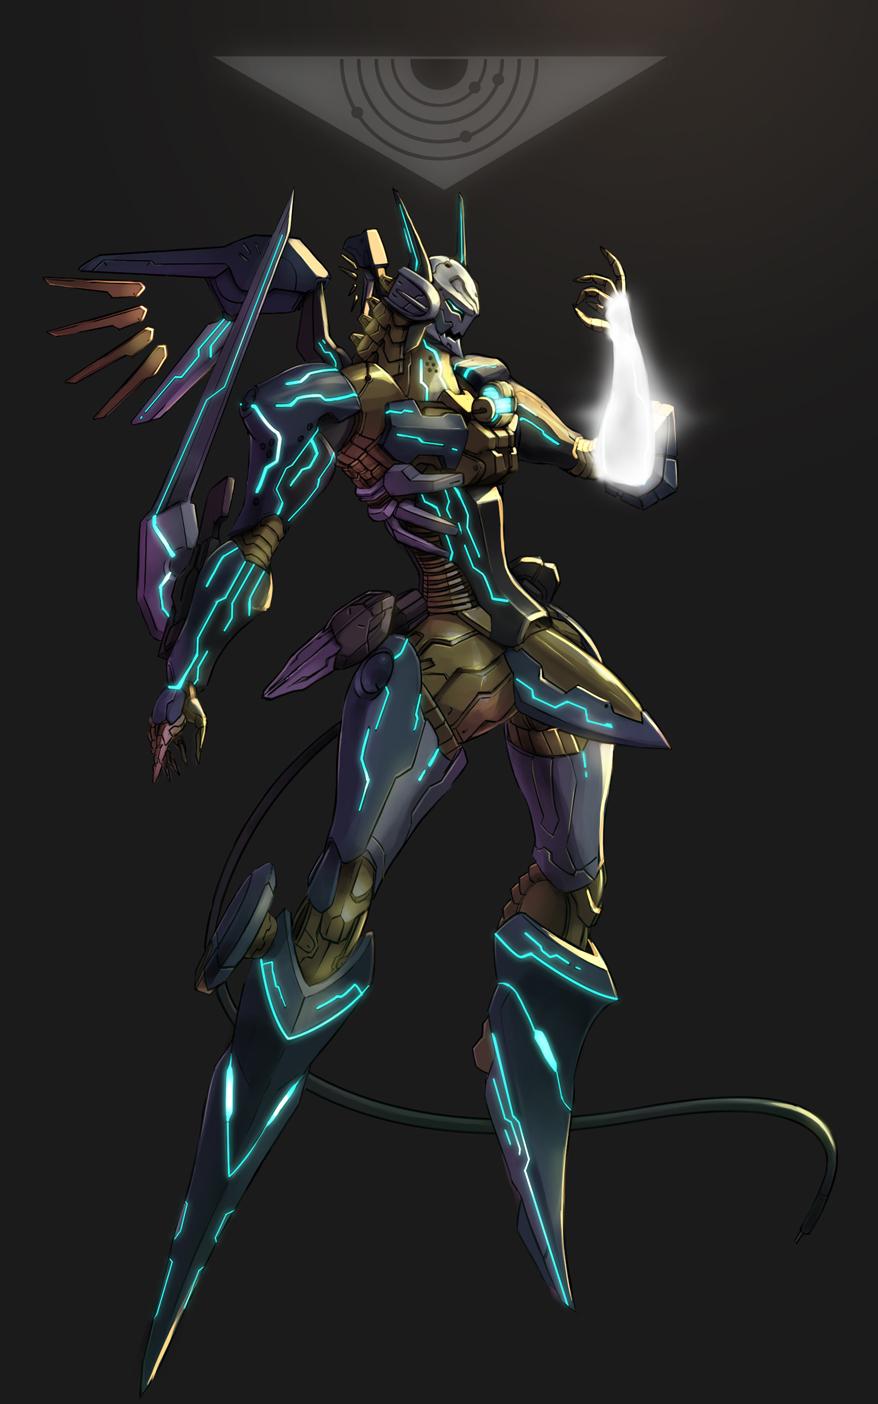 Zone of the Enders Image #1397534 - Zerochan Anime Image Board